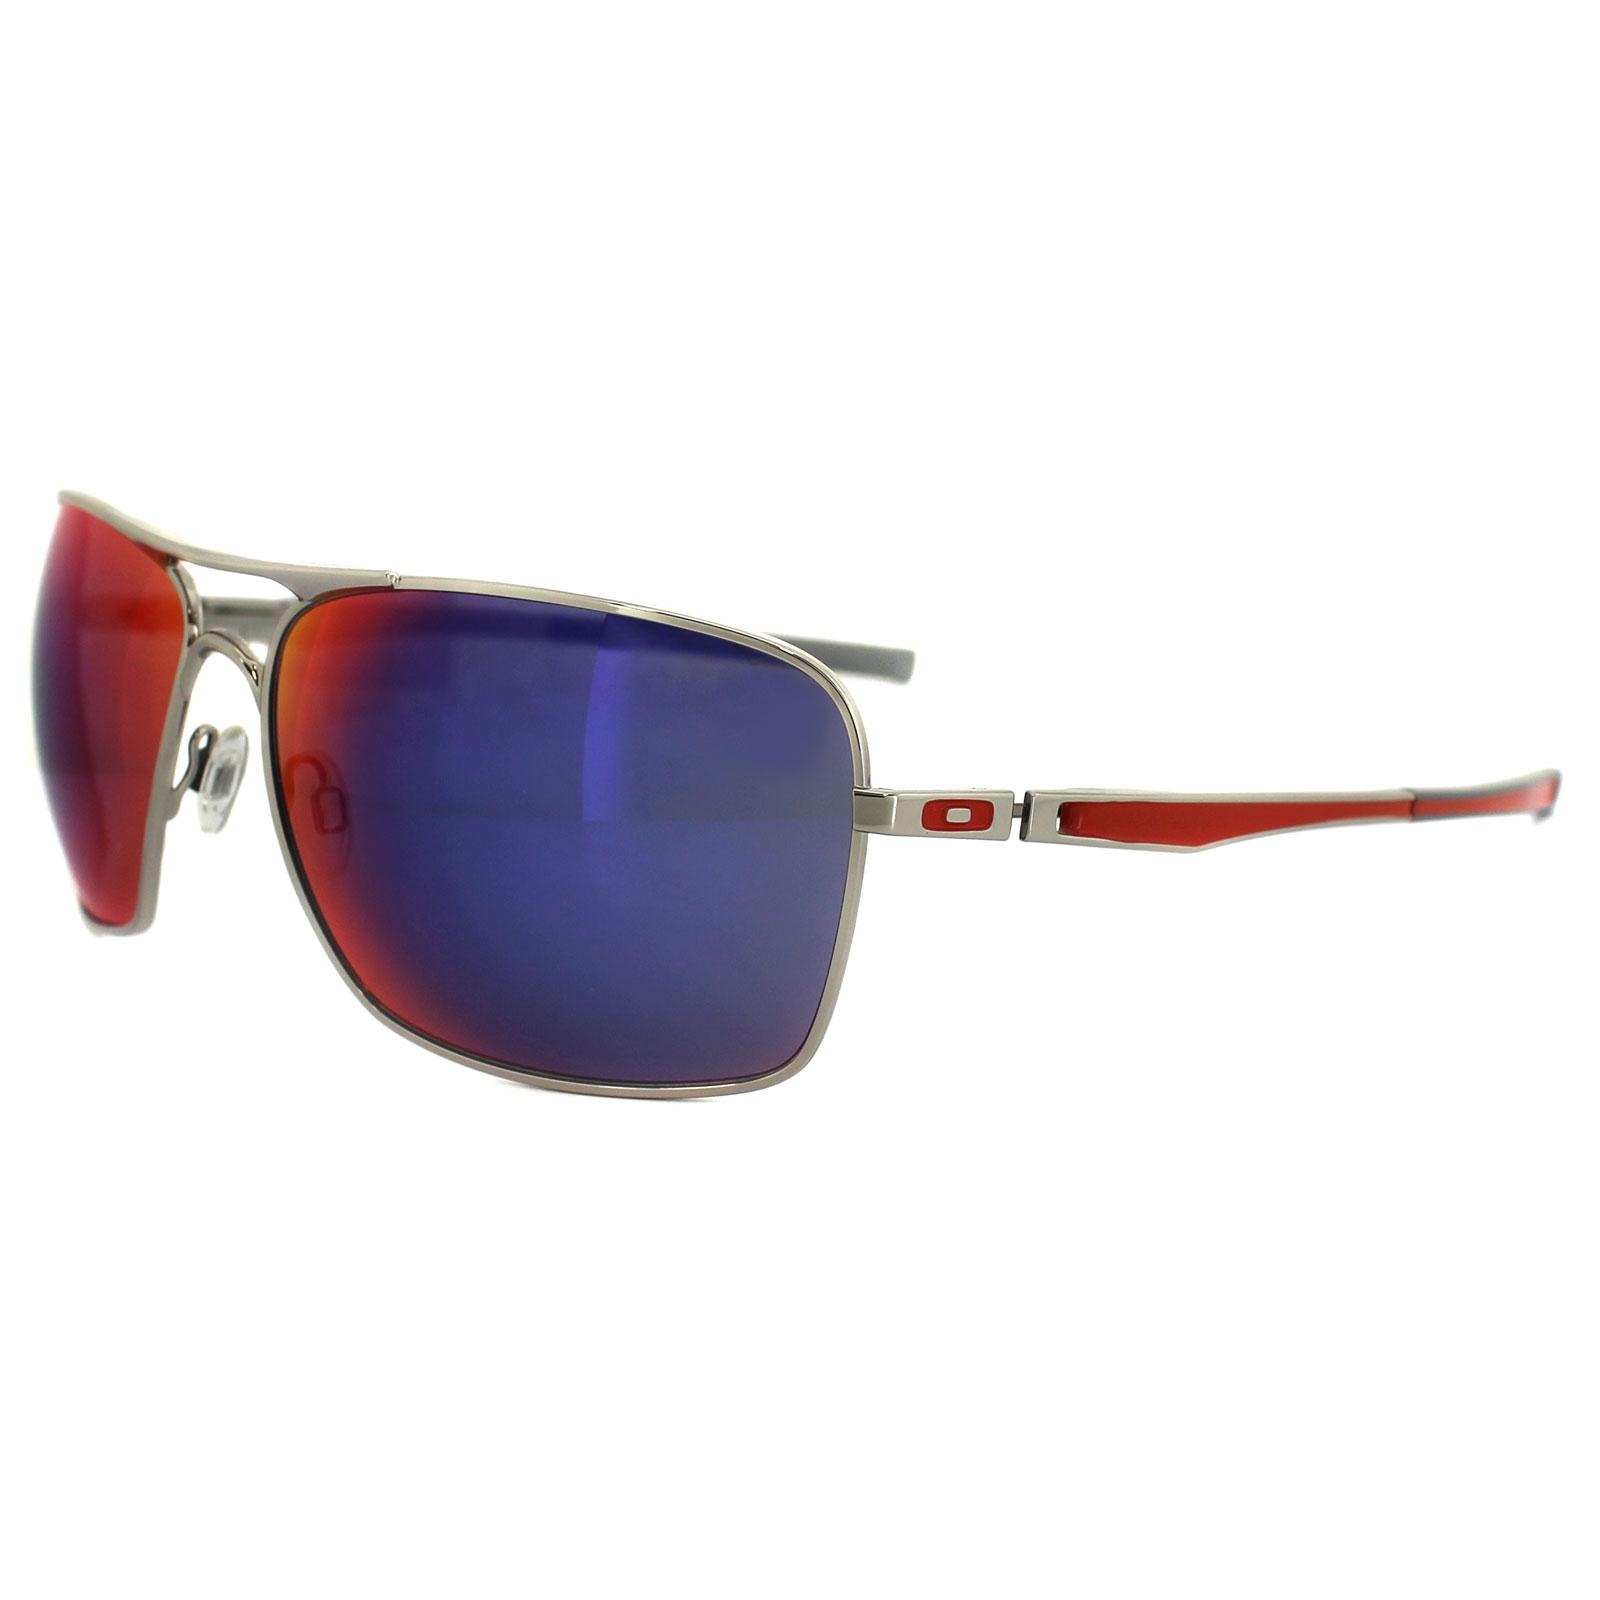 llyzp Cheap Oakley Sunglasses Plaintiff Squared 4063-07 Polished Chrome